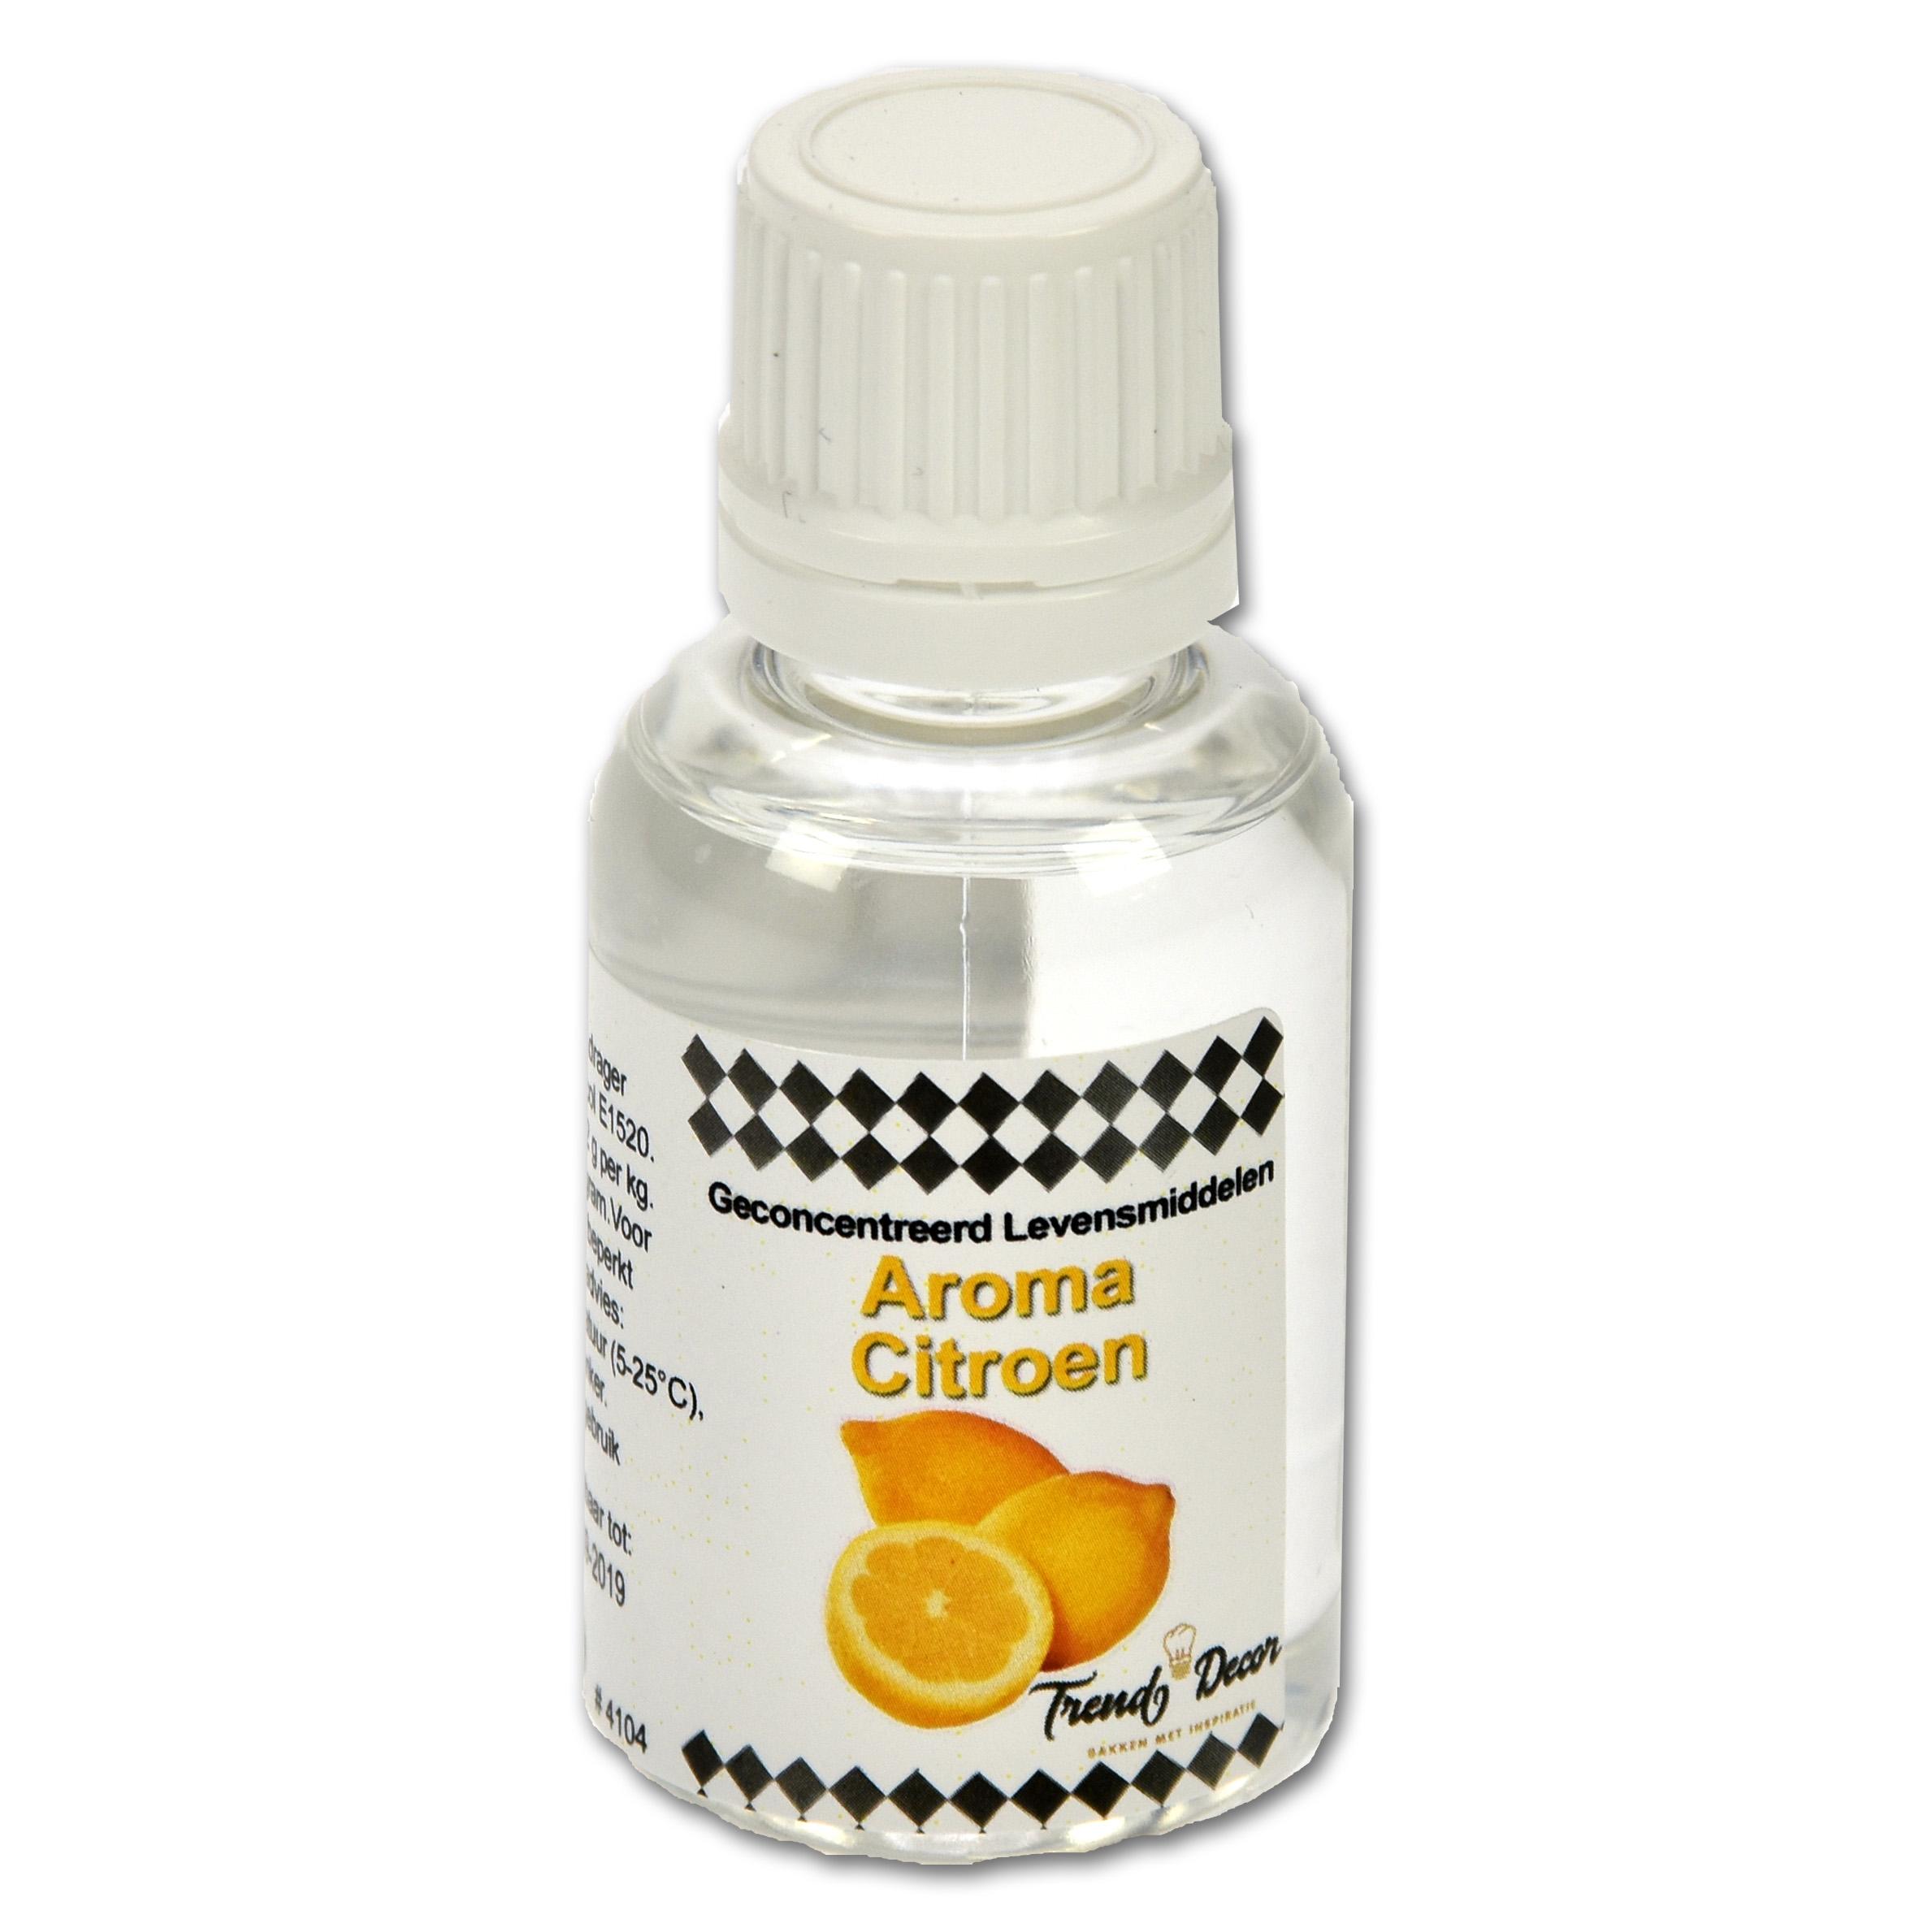 Geconcentreerd Levensmiddelen Aroma - Citroen